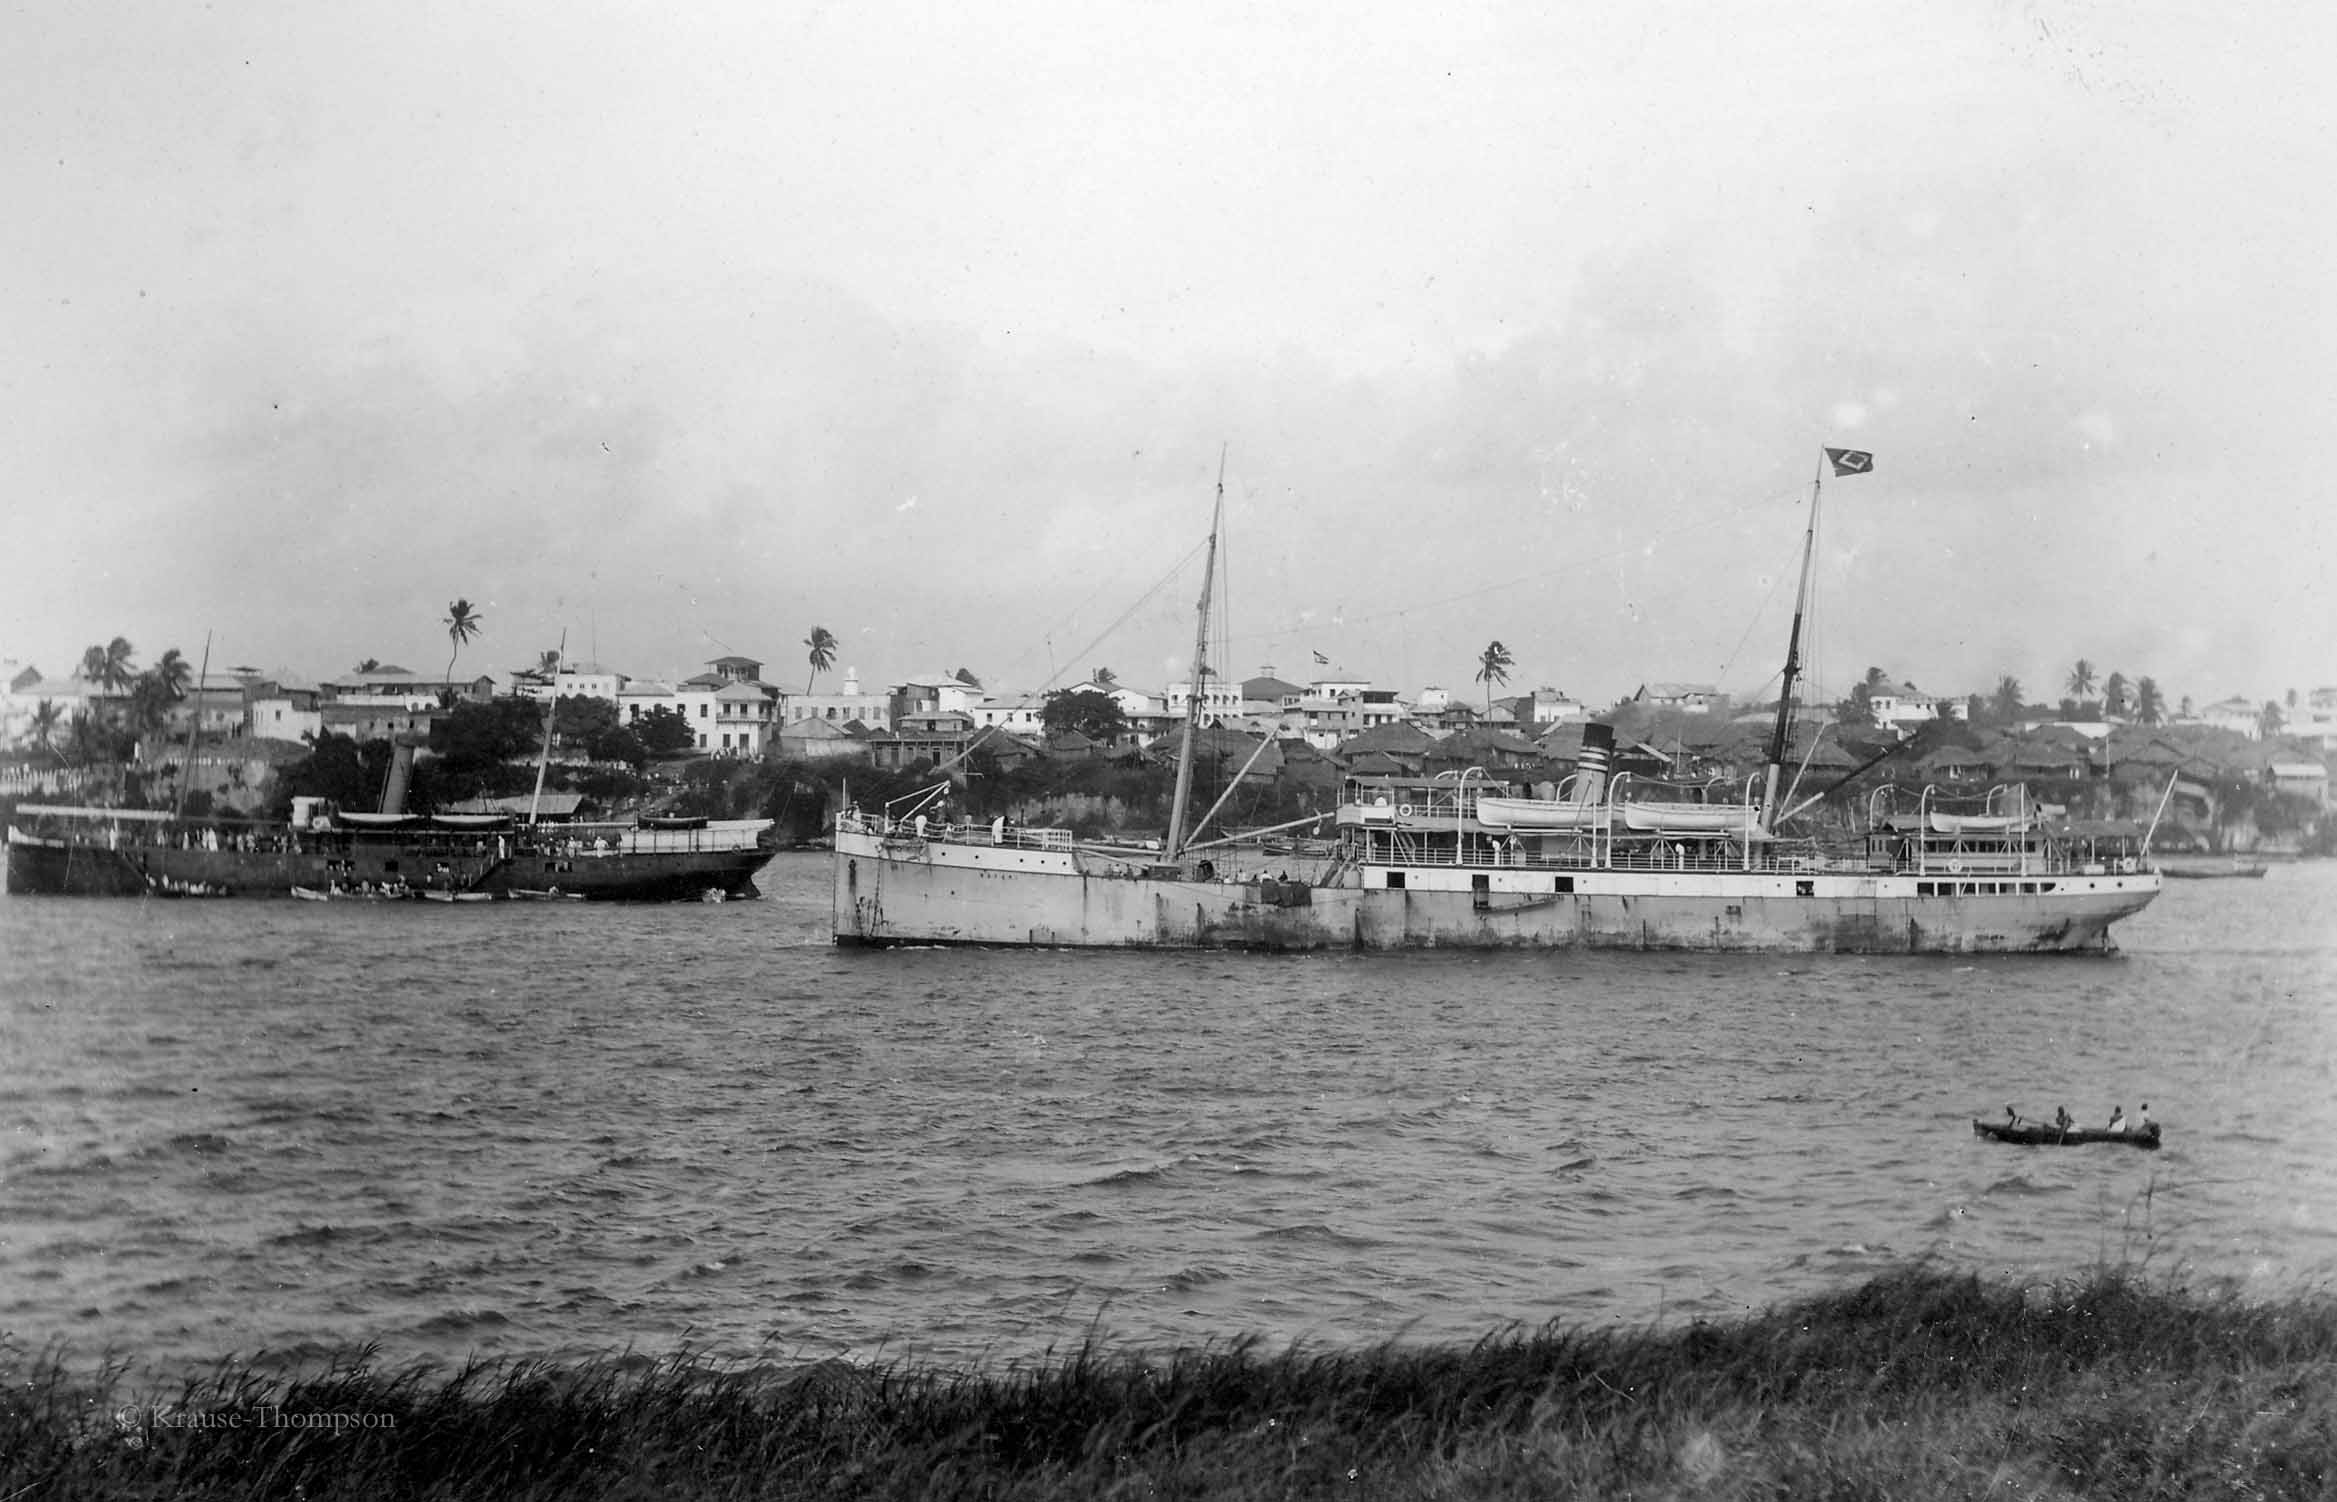 gneisenau-zzzf-ship-1